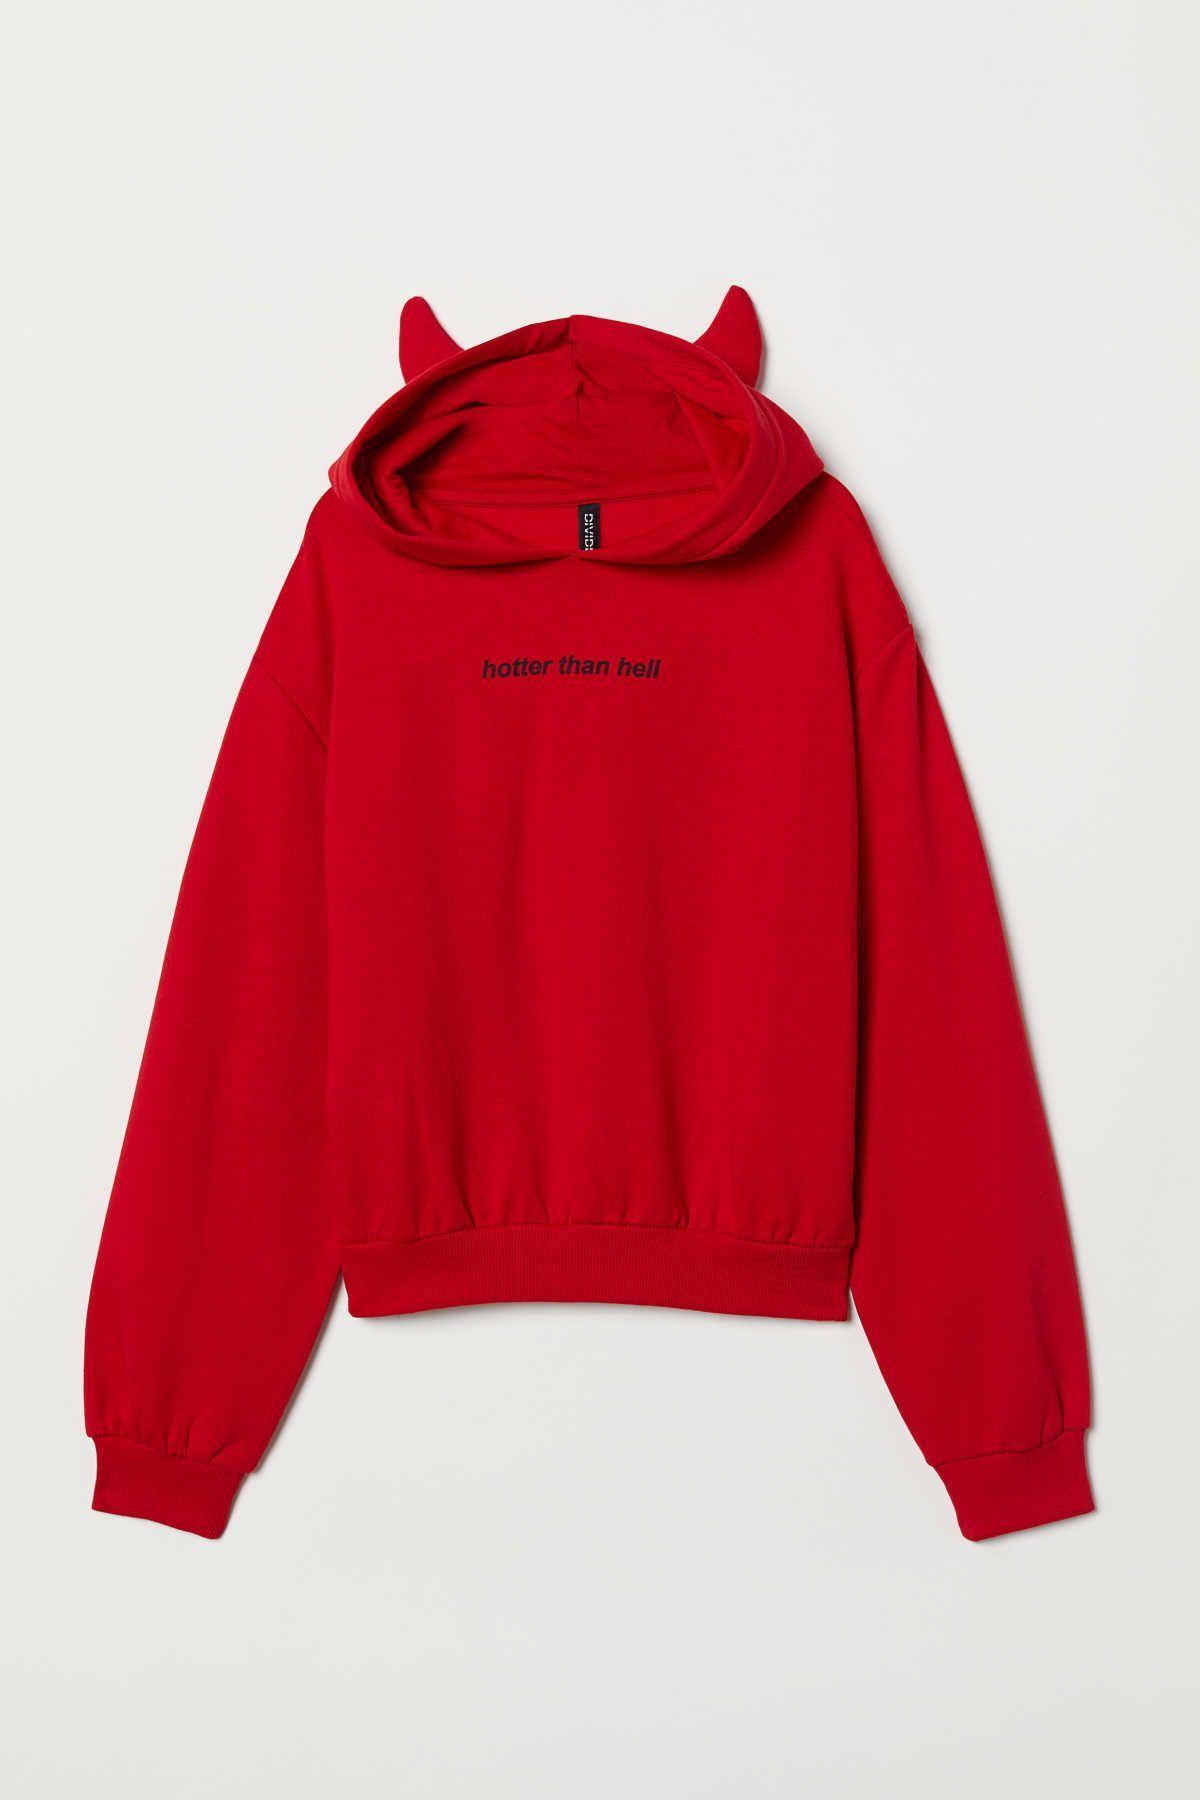 Rot. Kurzes bedrucktes Sweatshirt mit jerseygefütterter Kordelzugkapuze, übers…